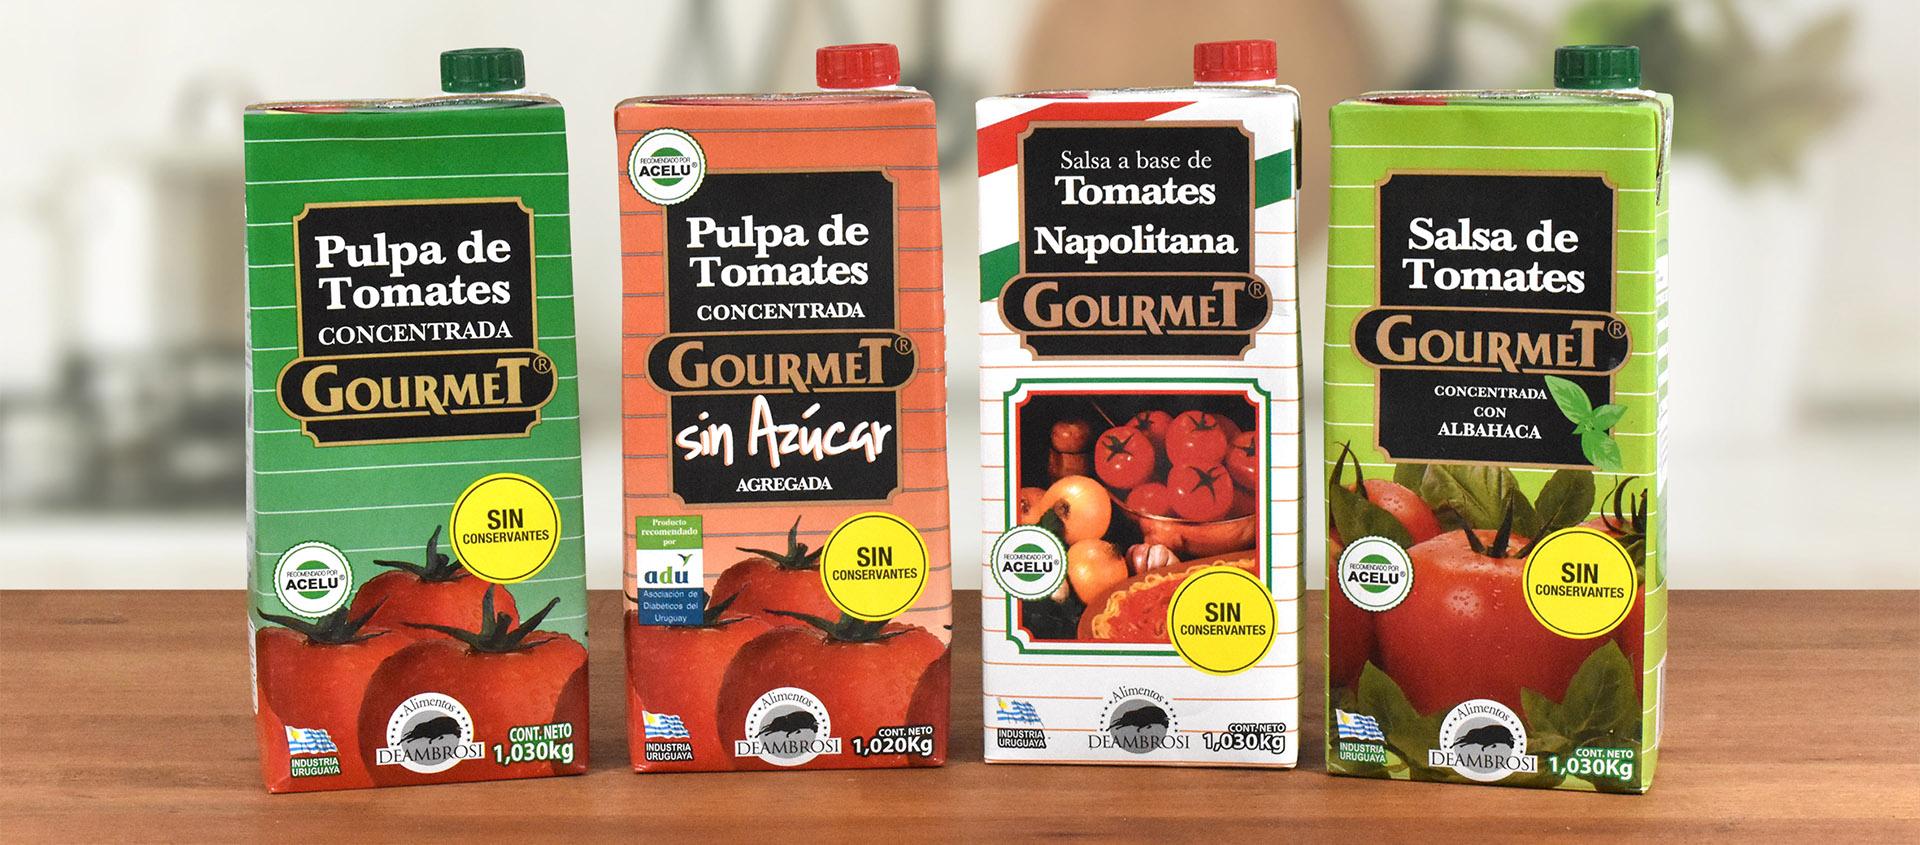 Pulpas de Tomate Gourmet